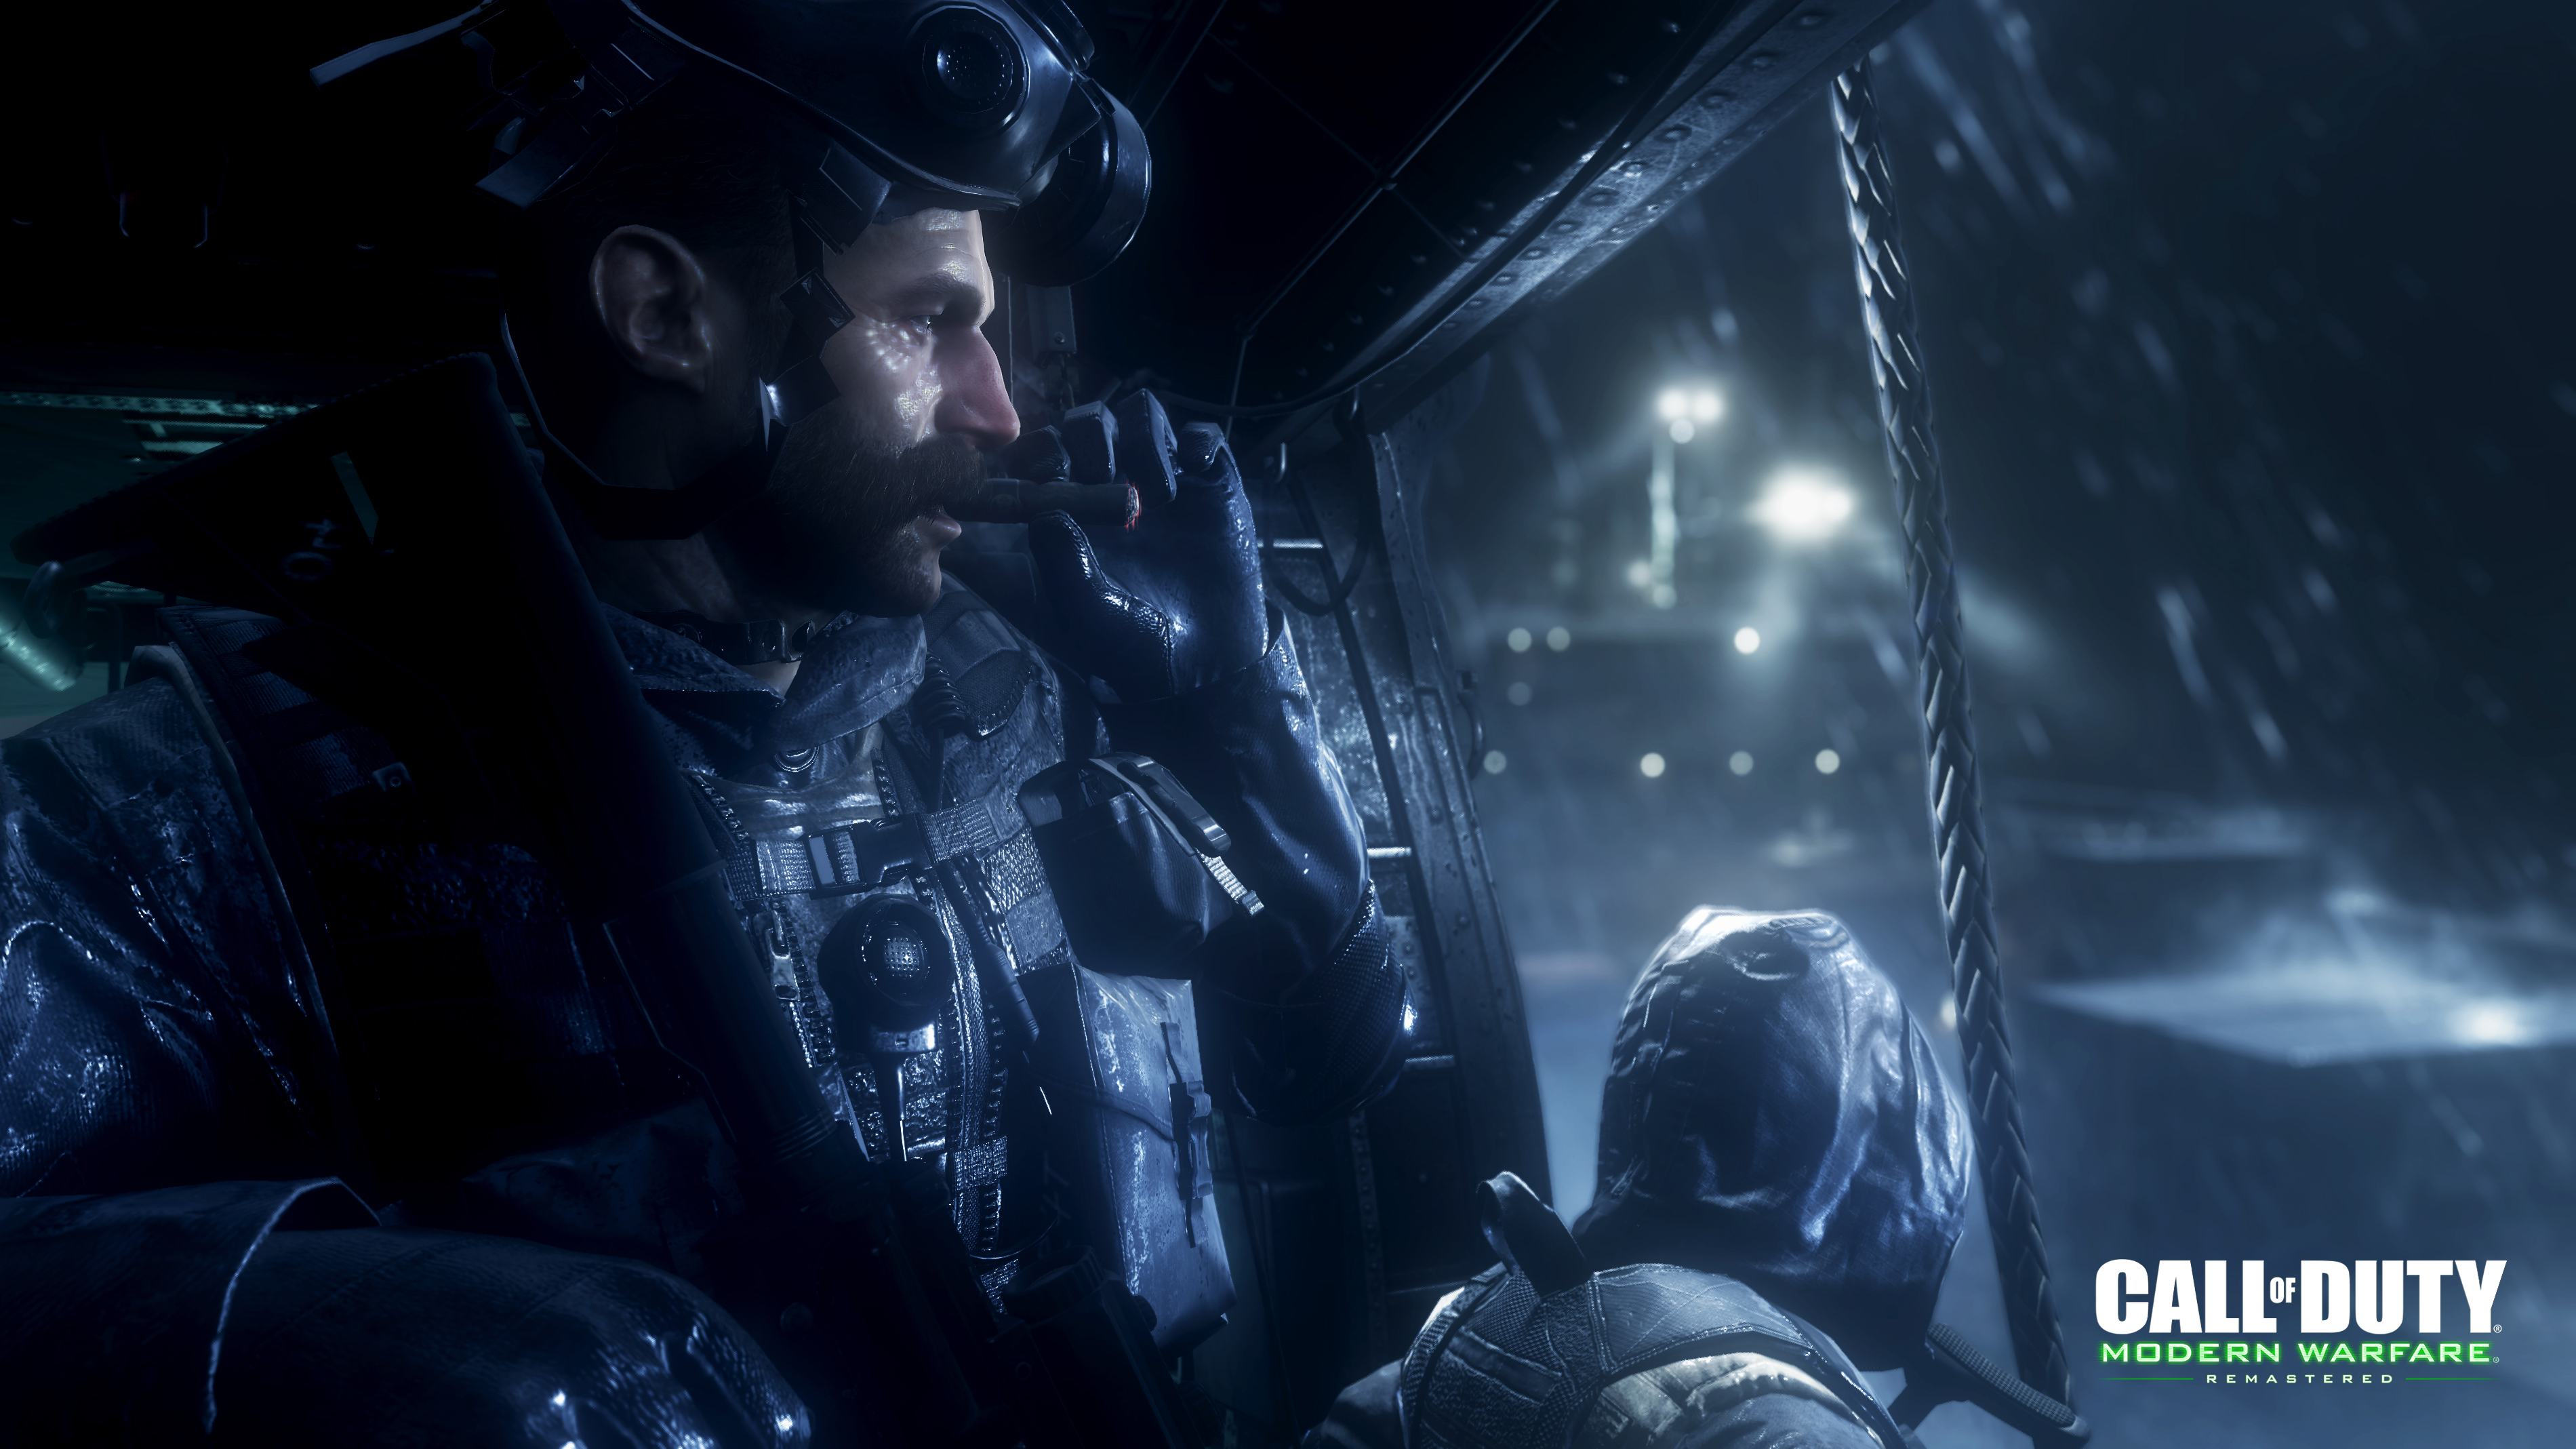 1280x1024 Call Of Duty Modern Warfare Remastered 4k 1280x1024